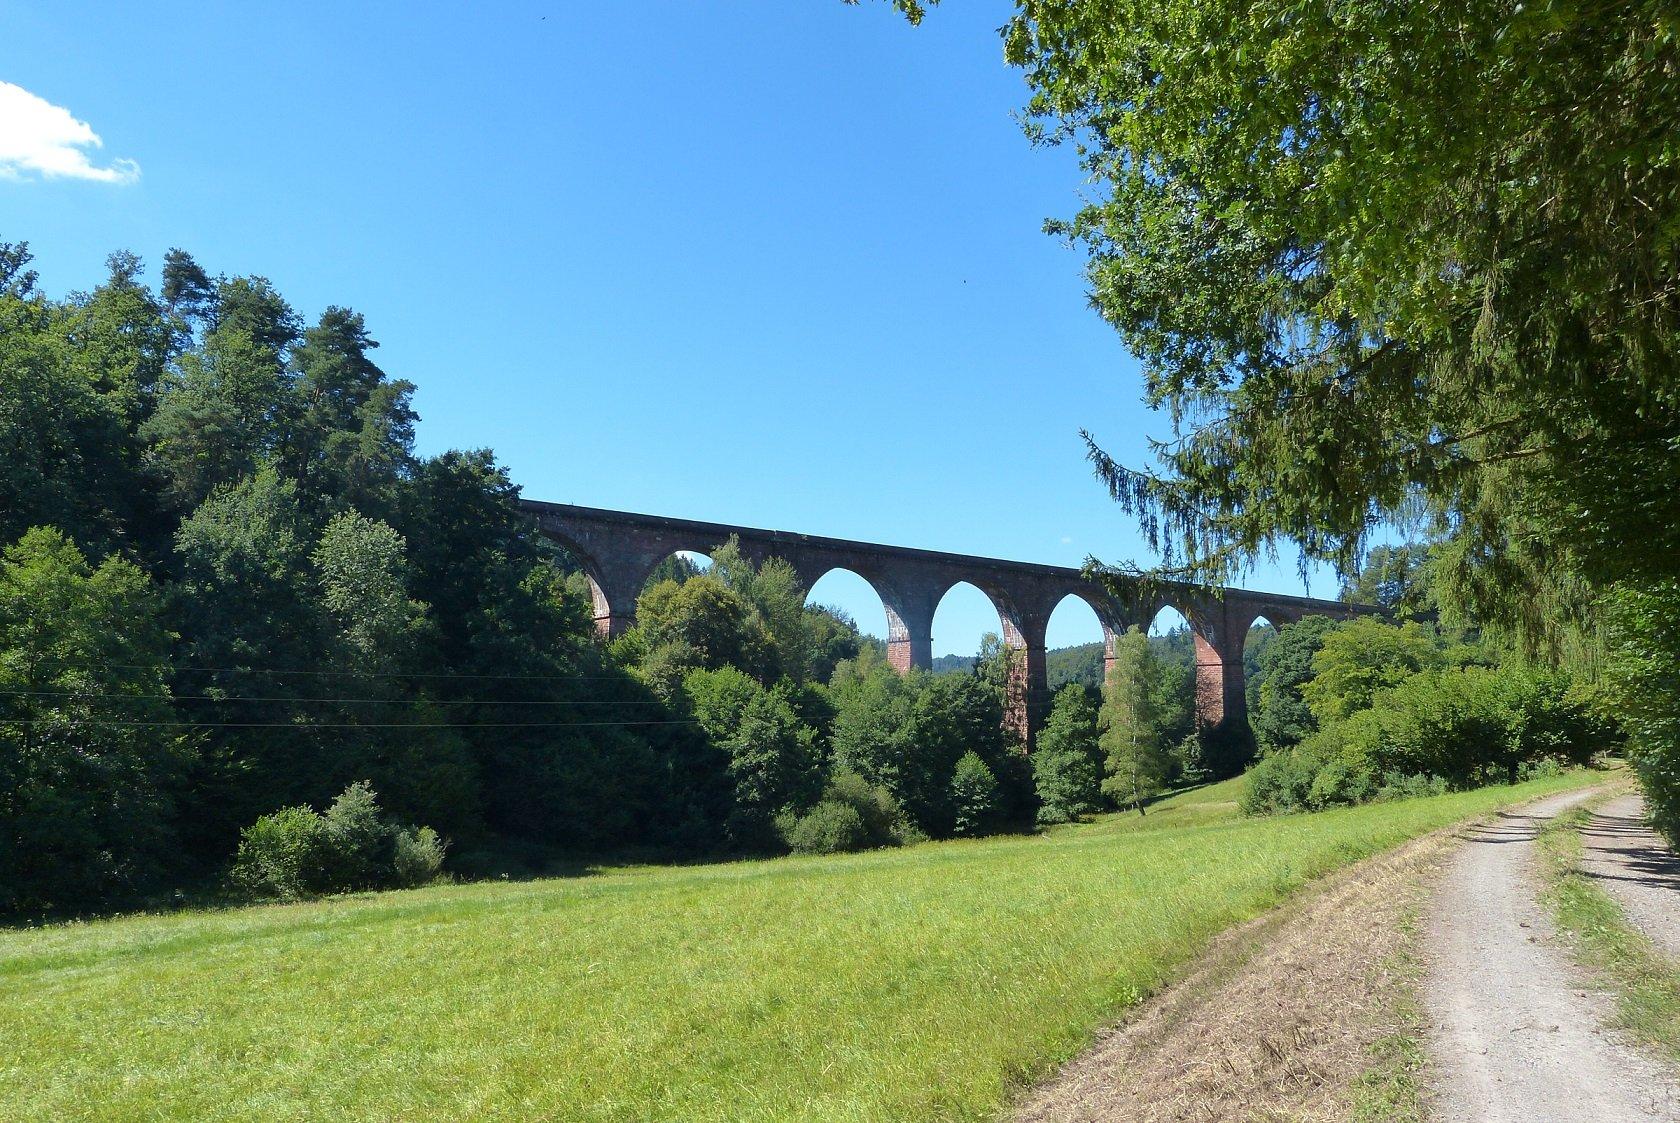 Oberzent Himbächel Viadukt